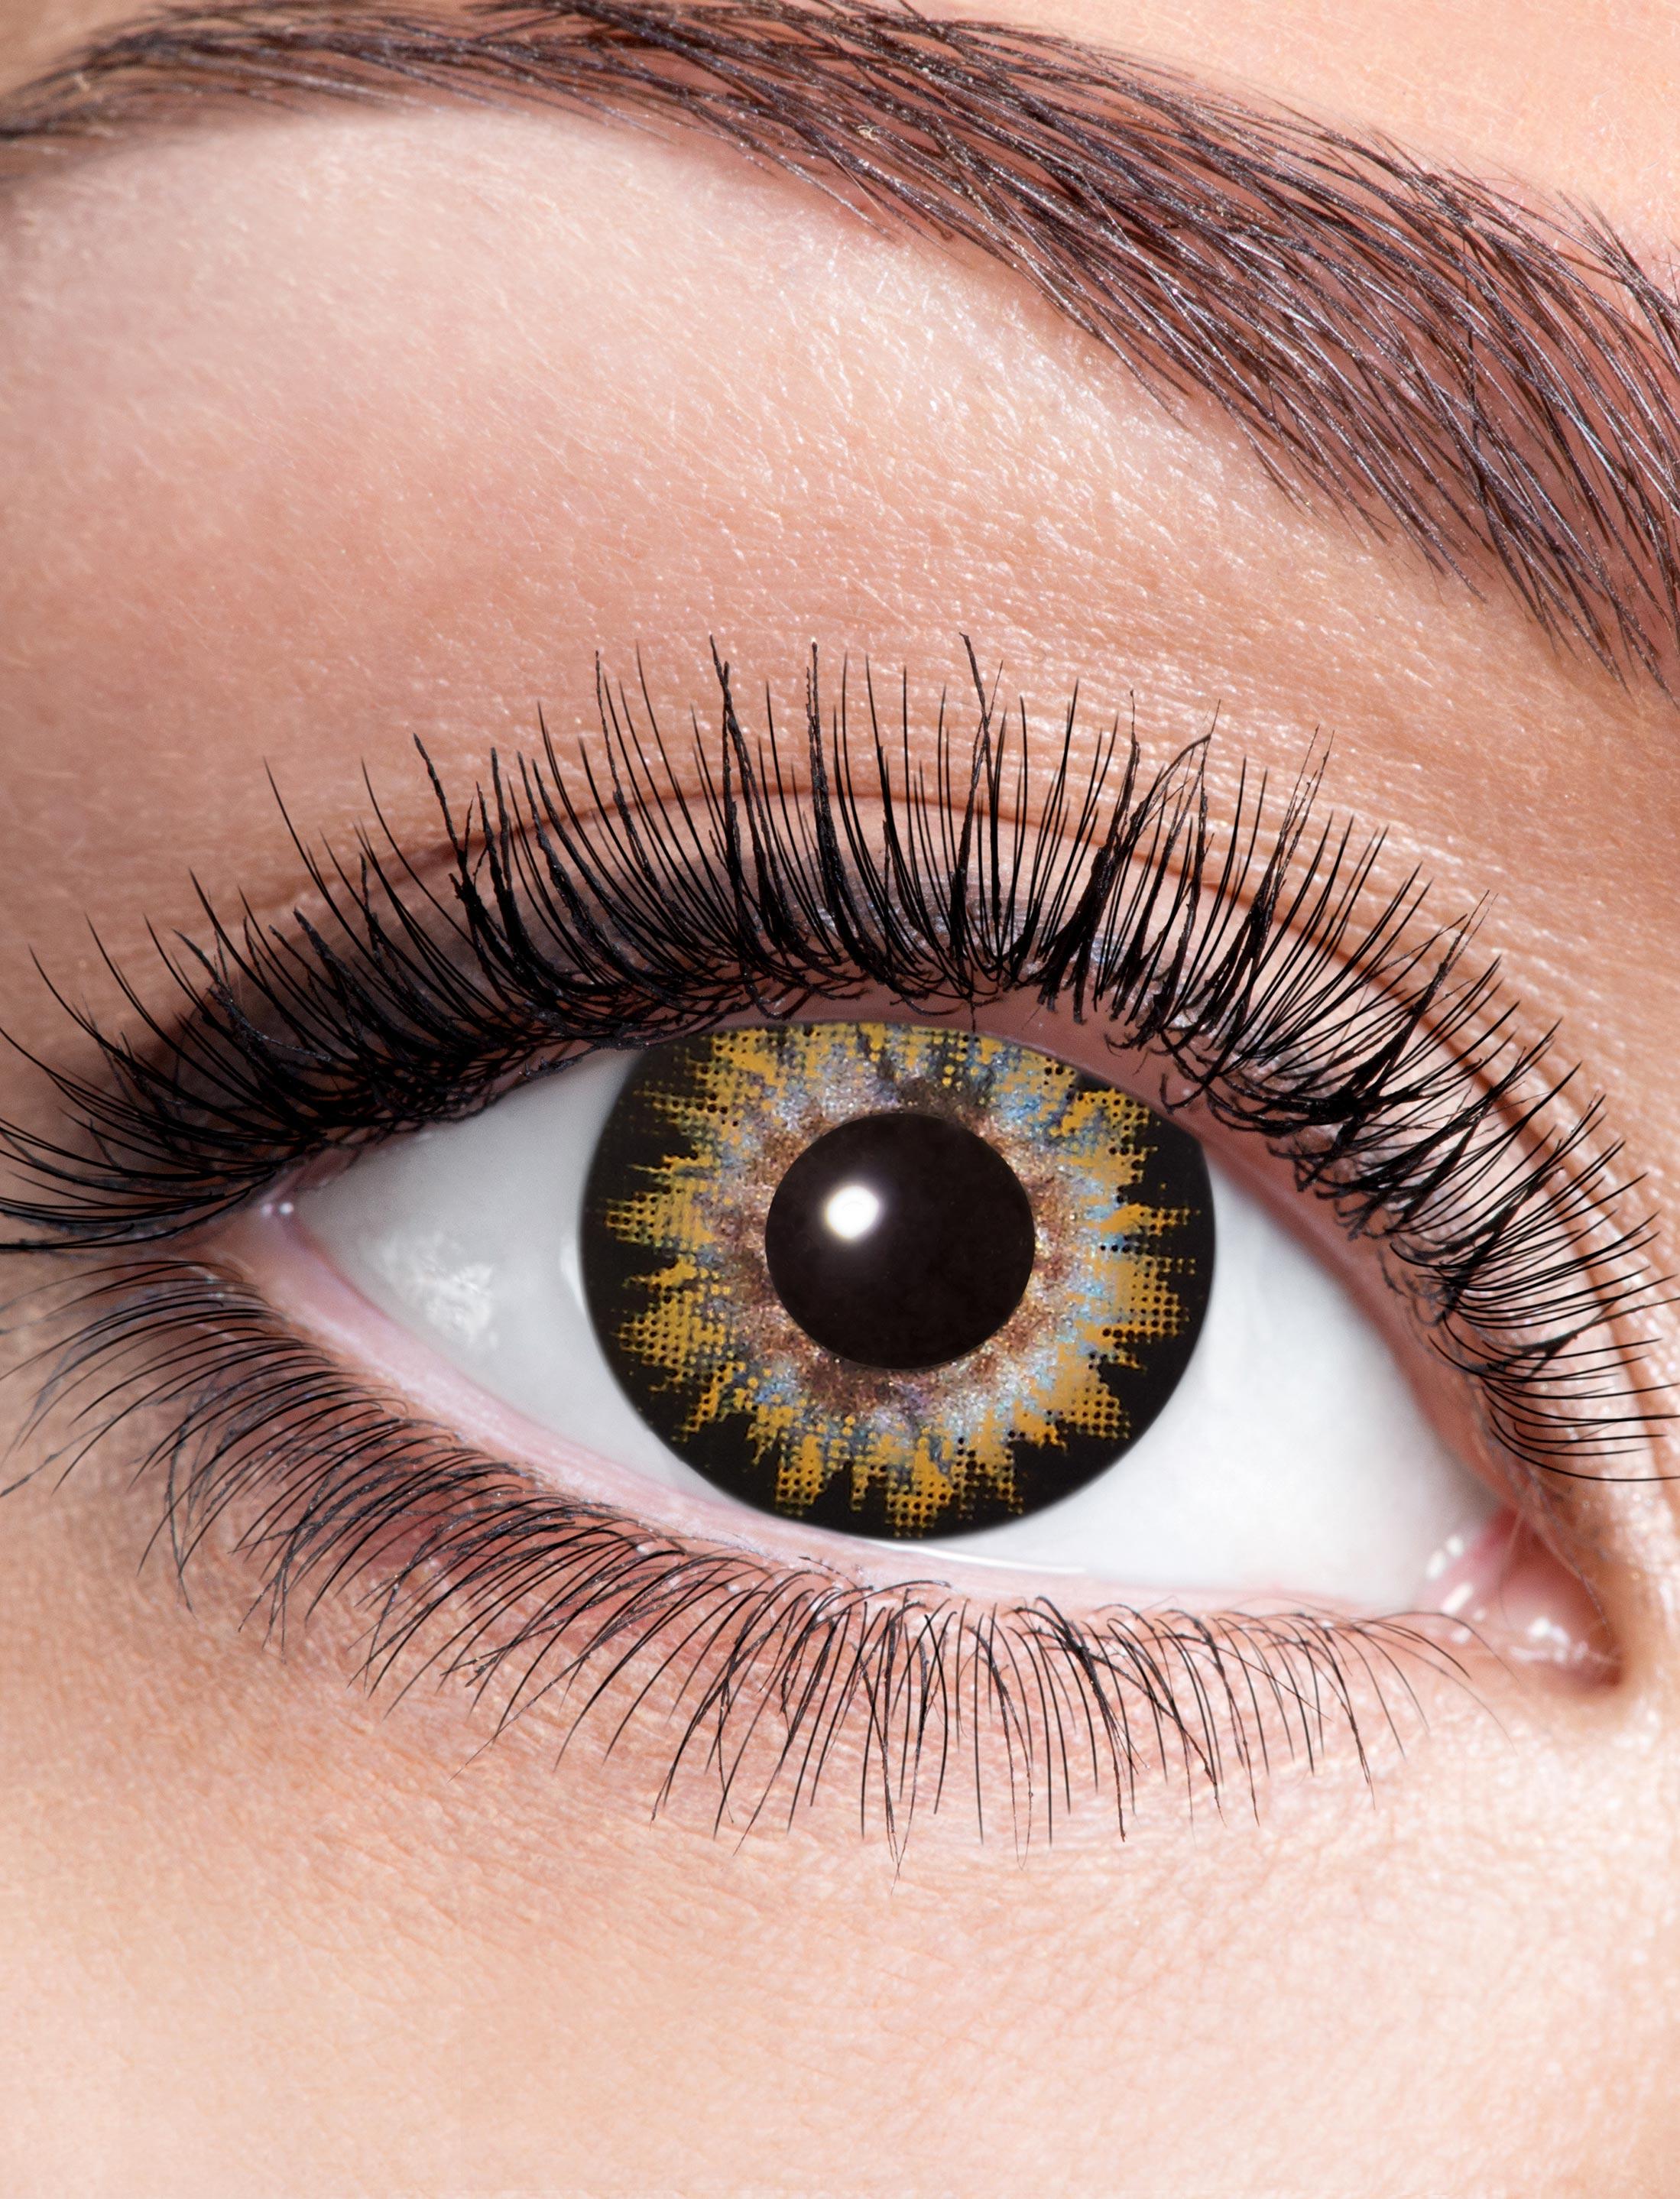 Kostuemzubehor Kontaktlinsen Two Tone Black/Brown Farbe: braun